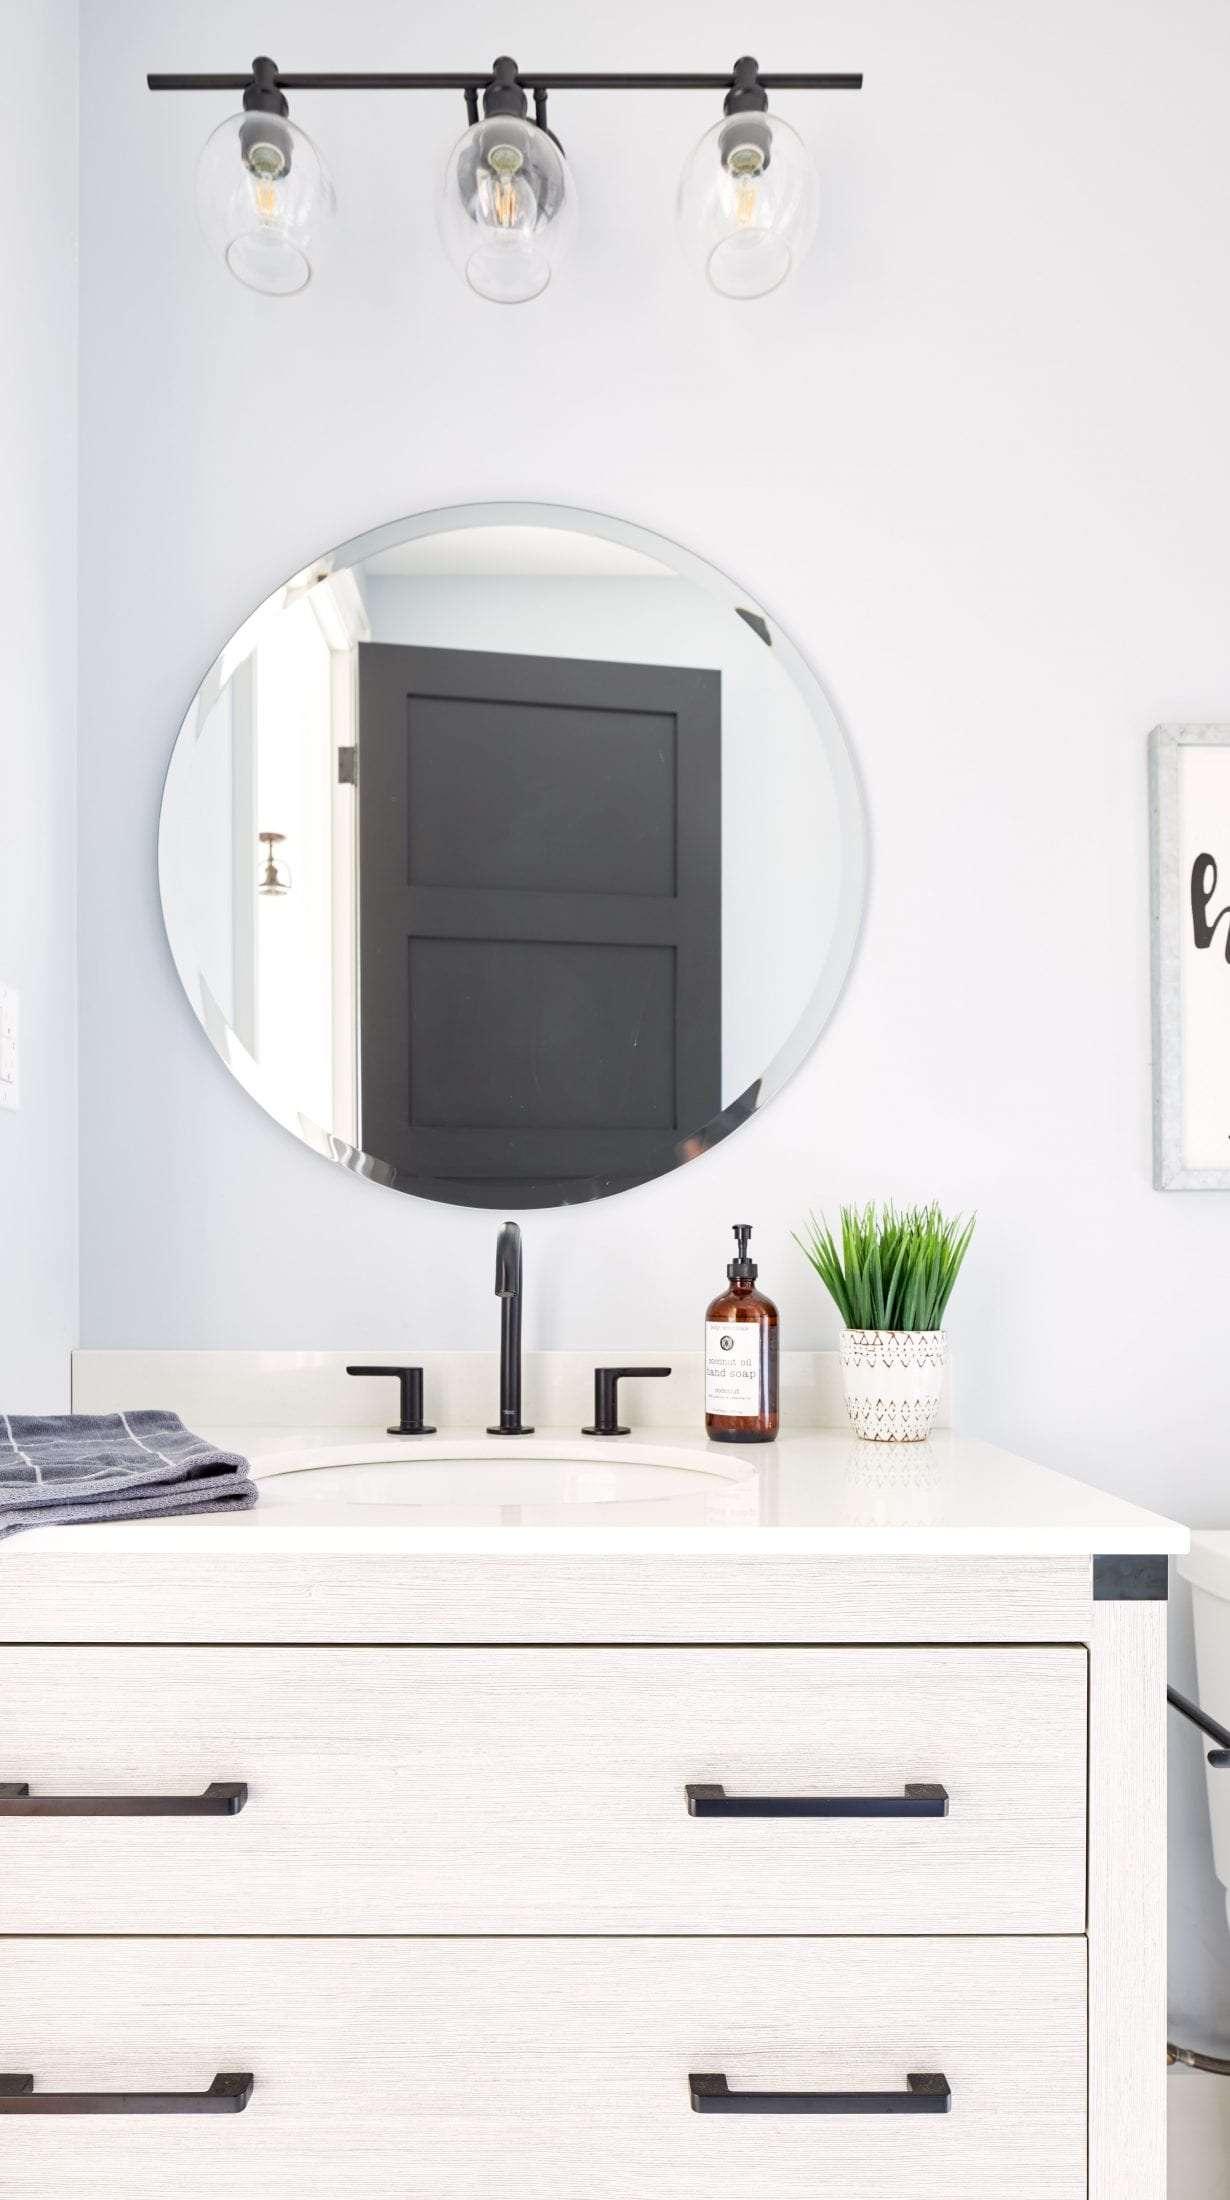 Guest bathroom round mirror above gray vanity